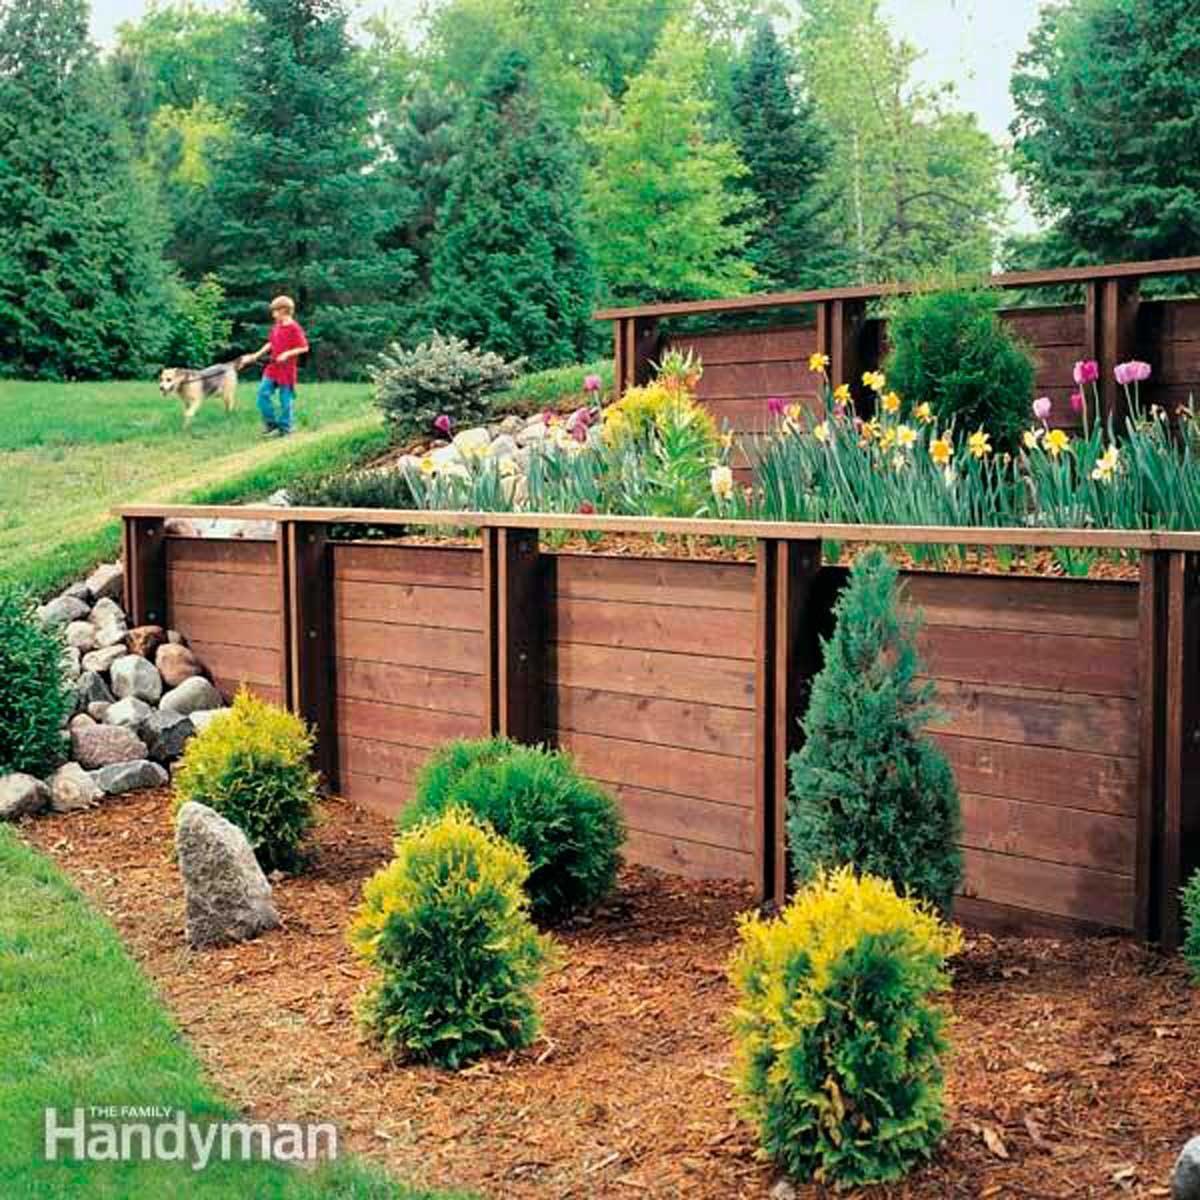 How to Build a Treated Wood Retaining Wall (DIY)  Family Handyman